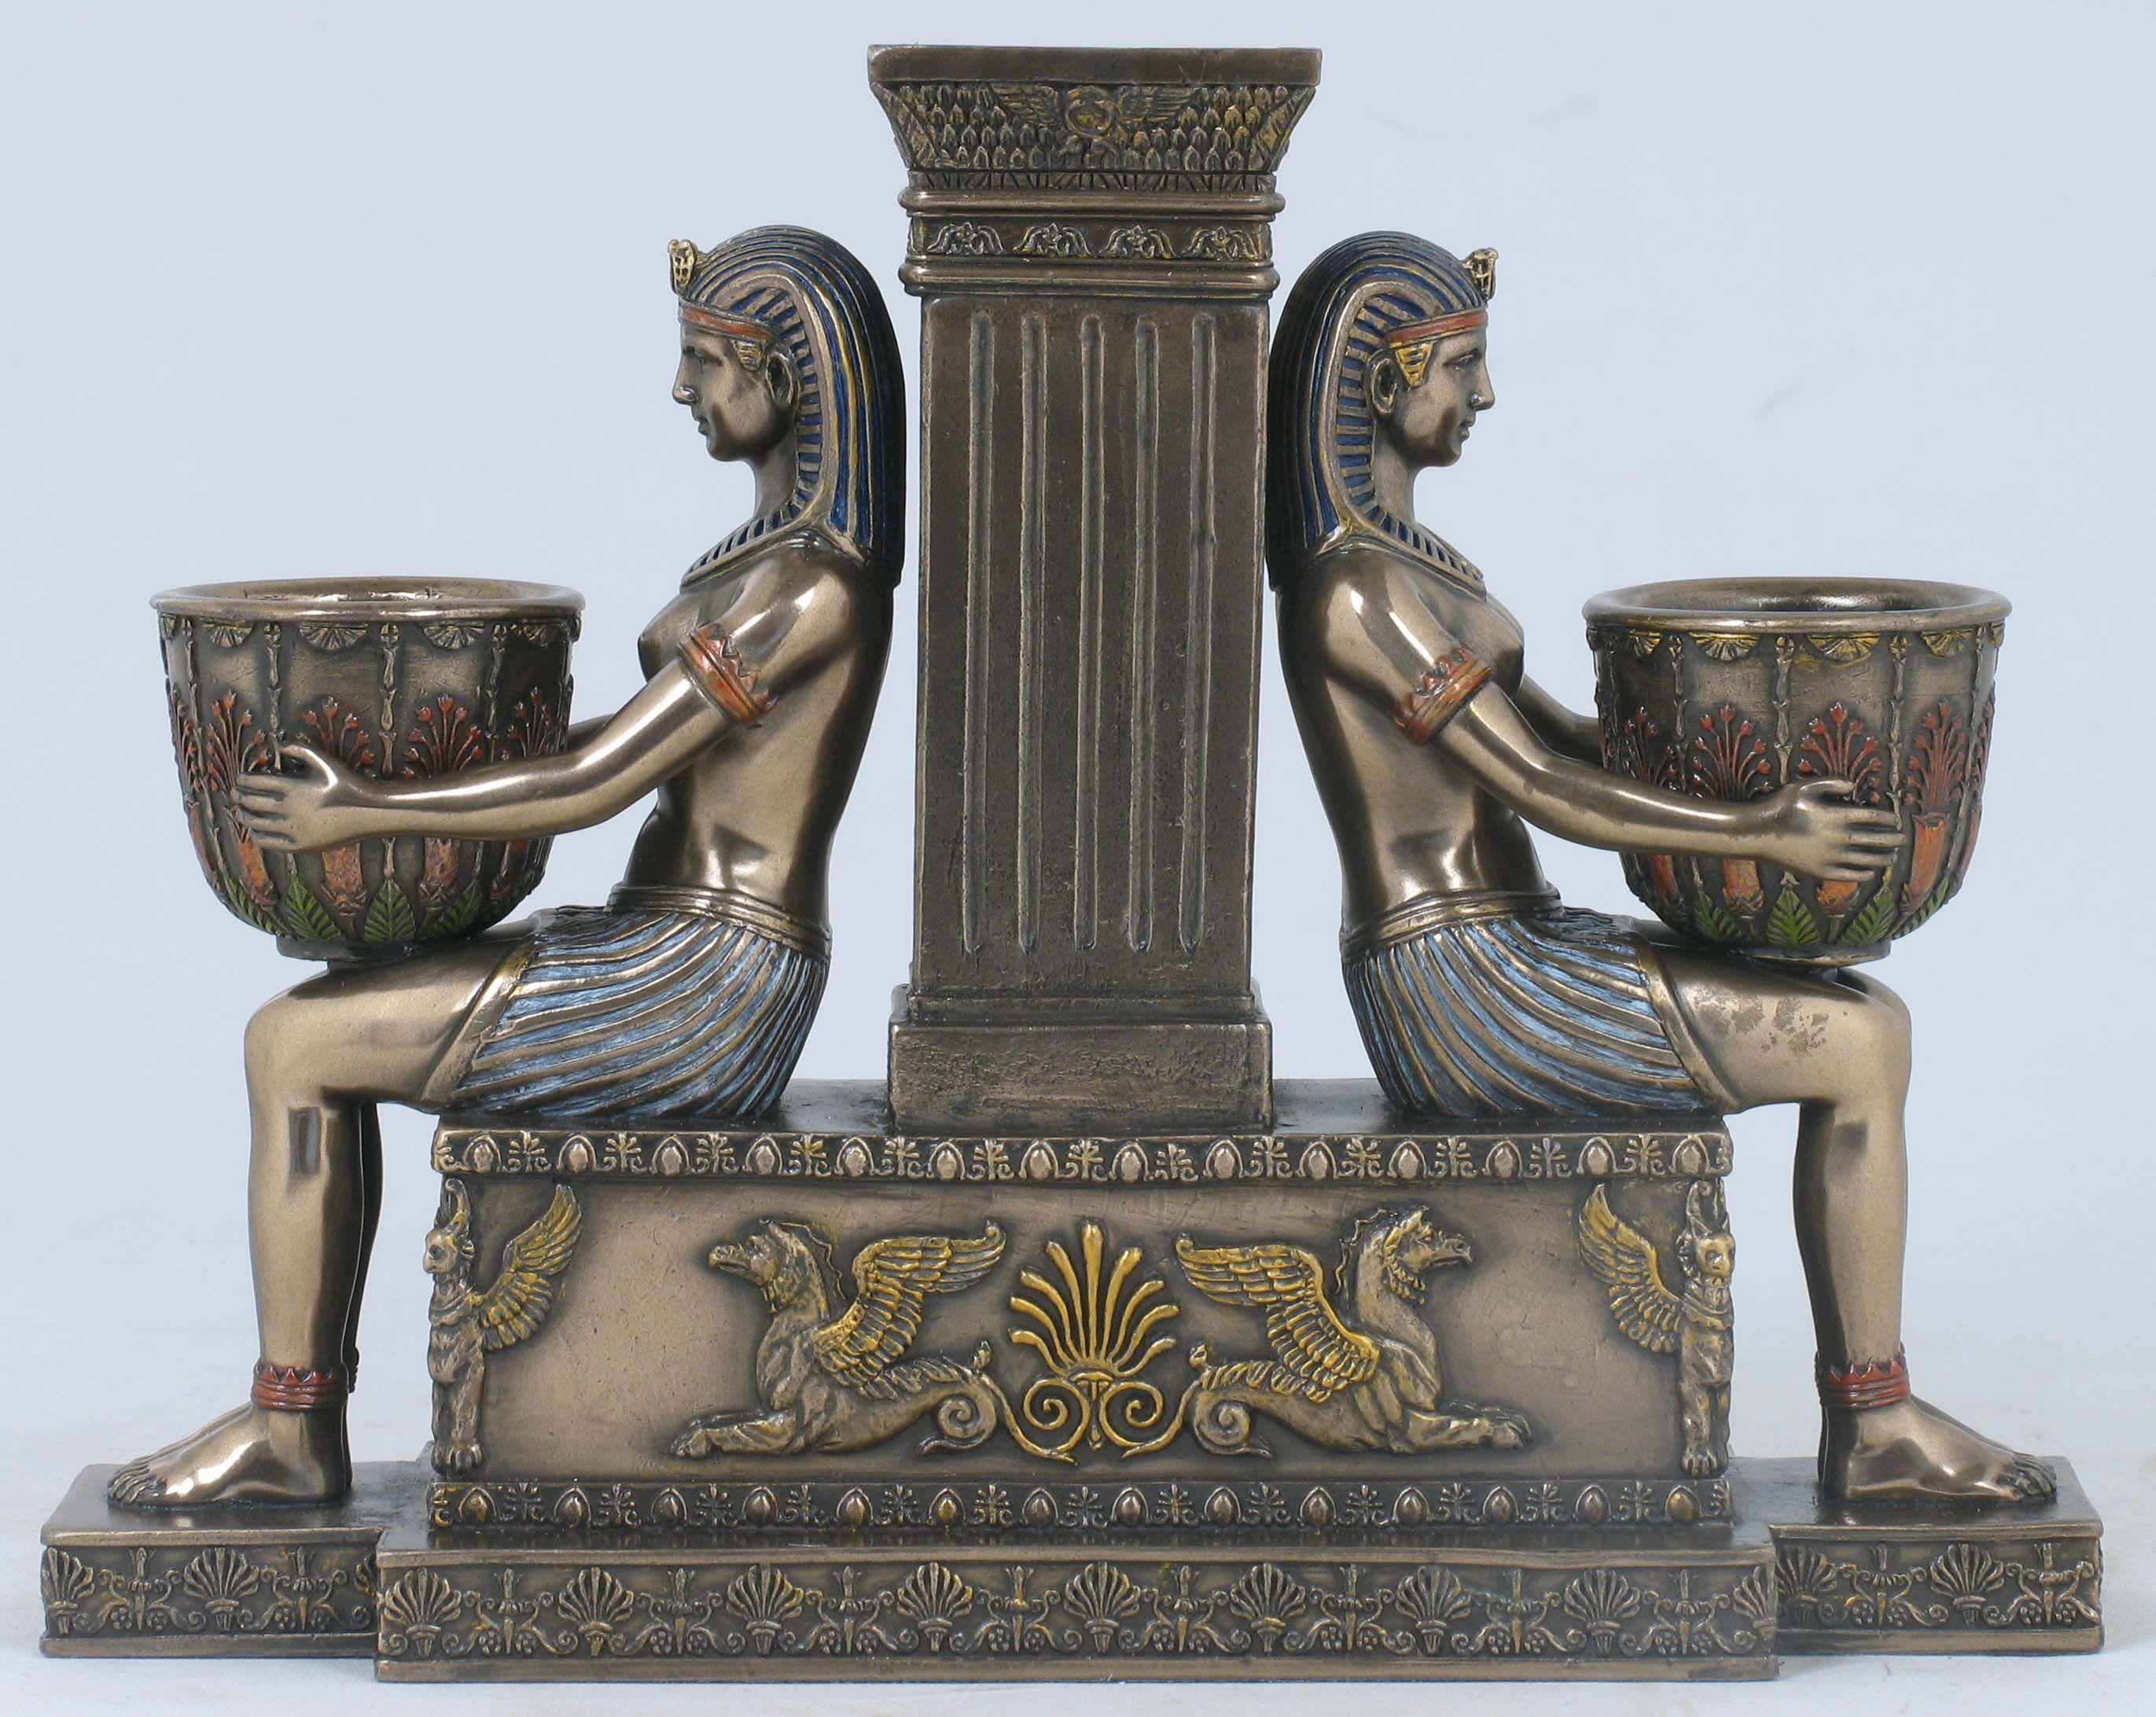 Napolionic Egyptian Candle Holder